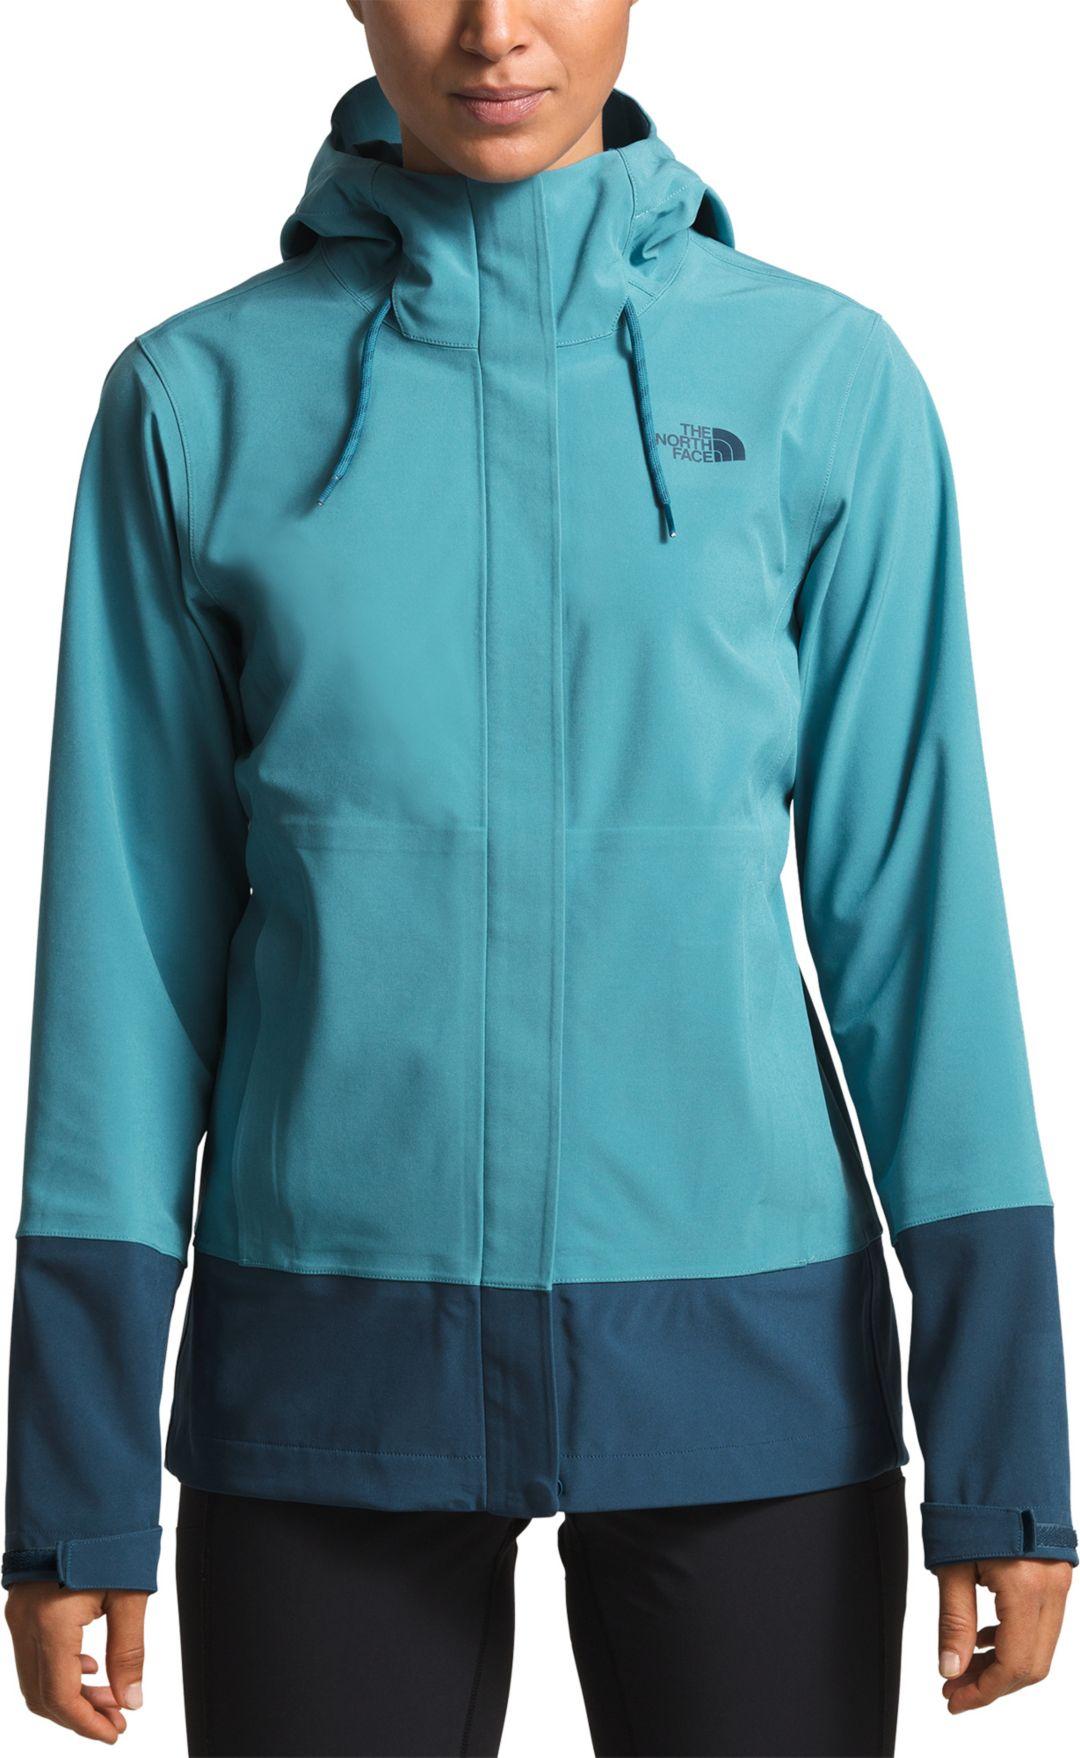 868f1e864 The North Face Women's Apex Flex DryVent Jacket